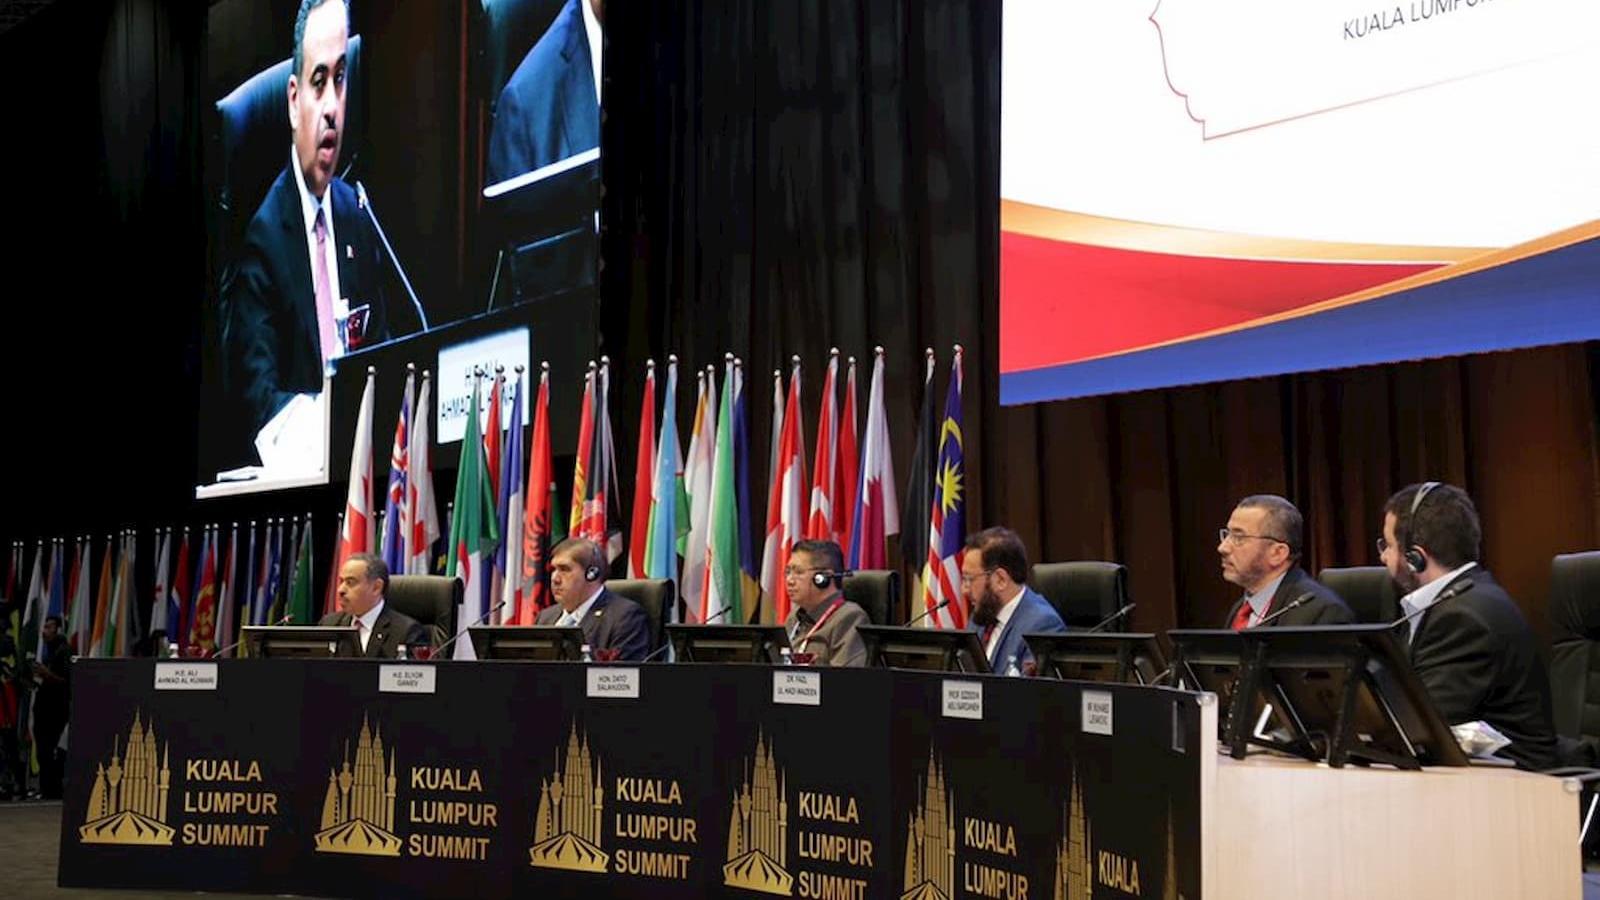 Food security Qatar's top priority on developmental level: Al Kuwari